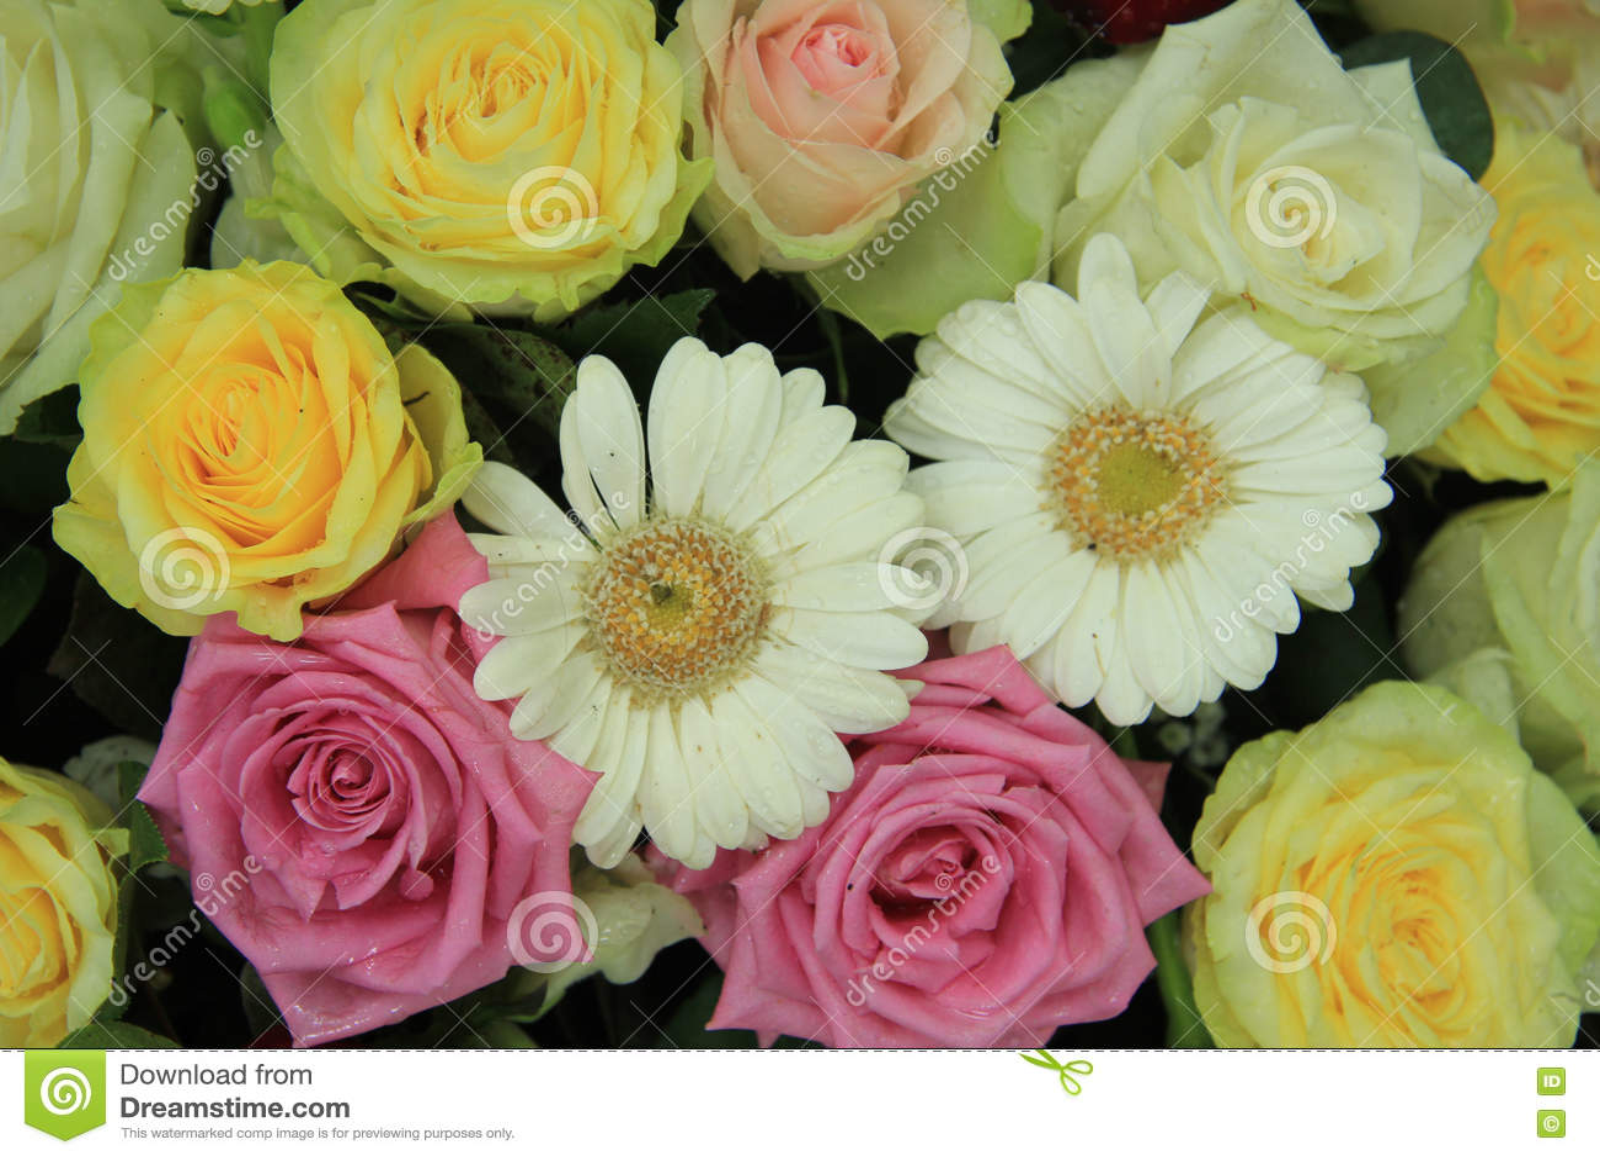 Yellow White And Pink Wedding Flowers Stock Photo Image Of Yellow